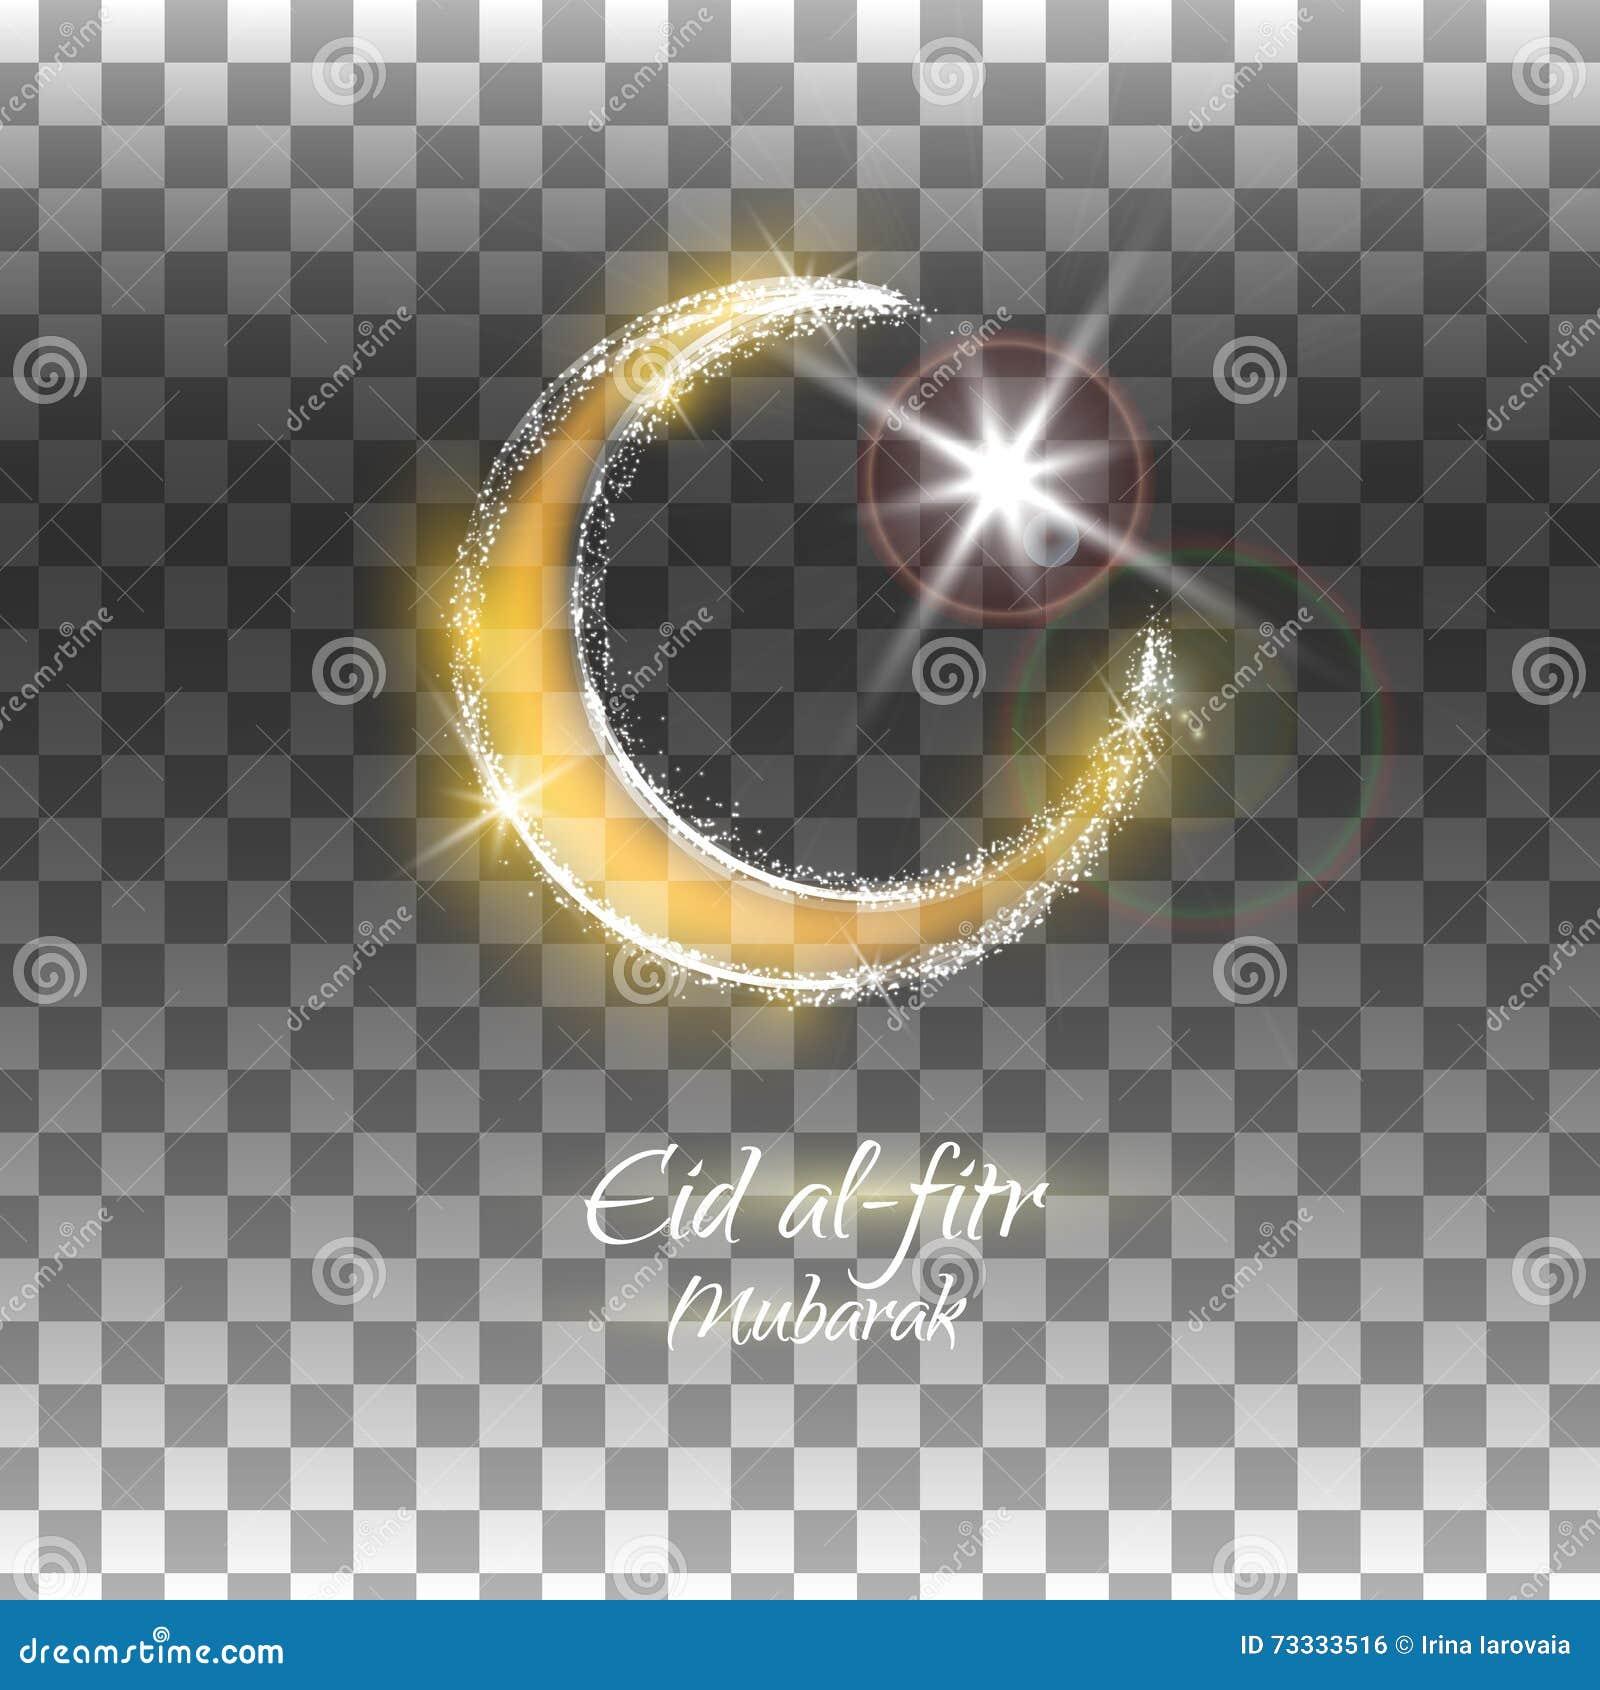 Eid Al-fitr Vector Illustration On Transparent Background